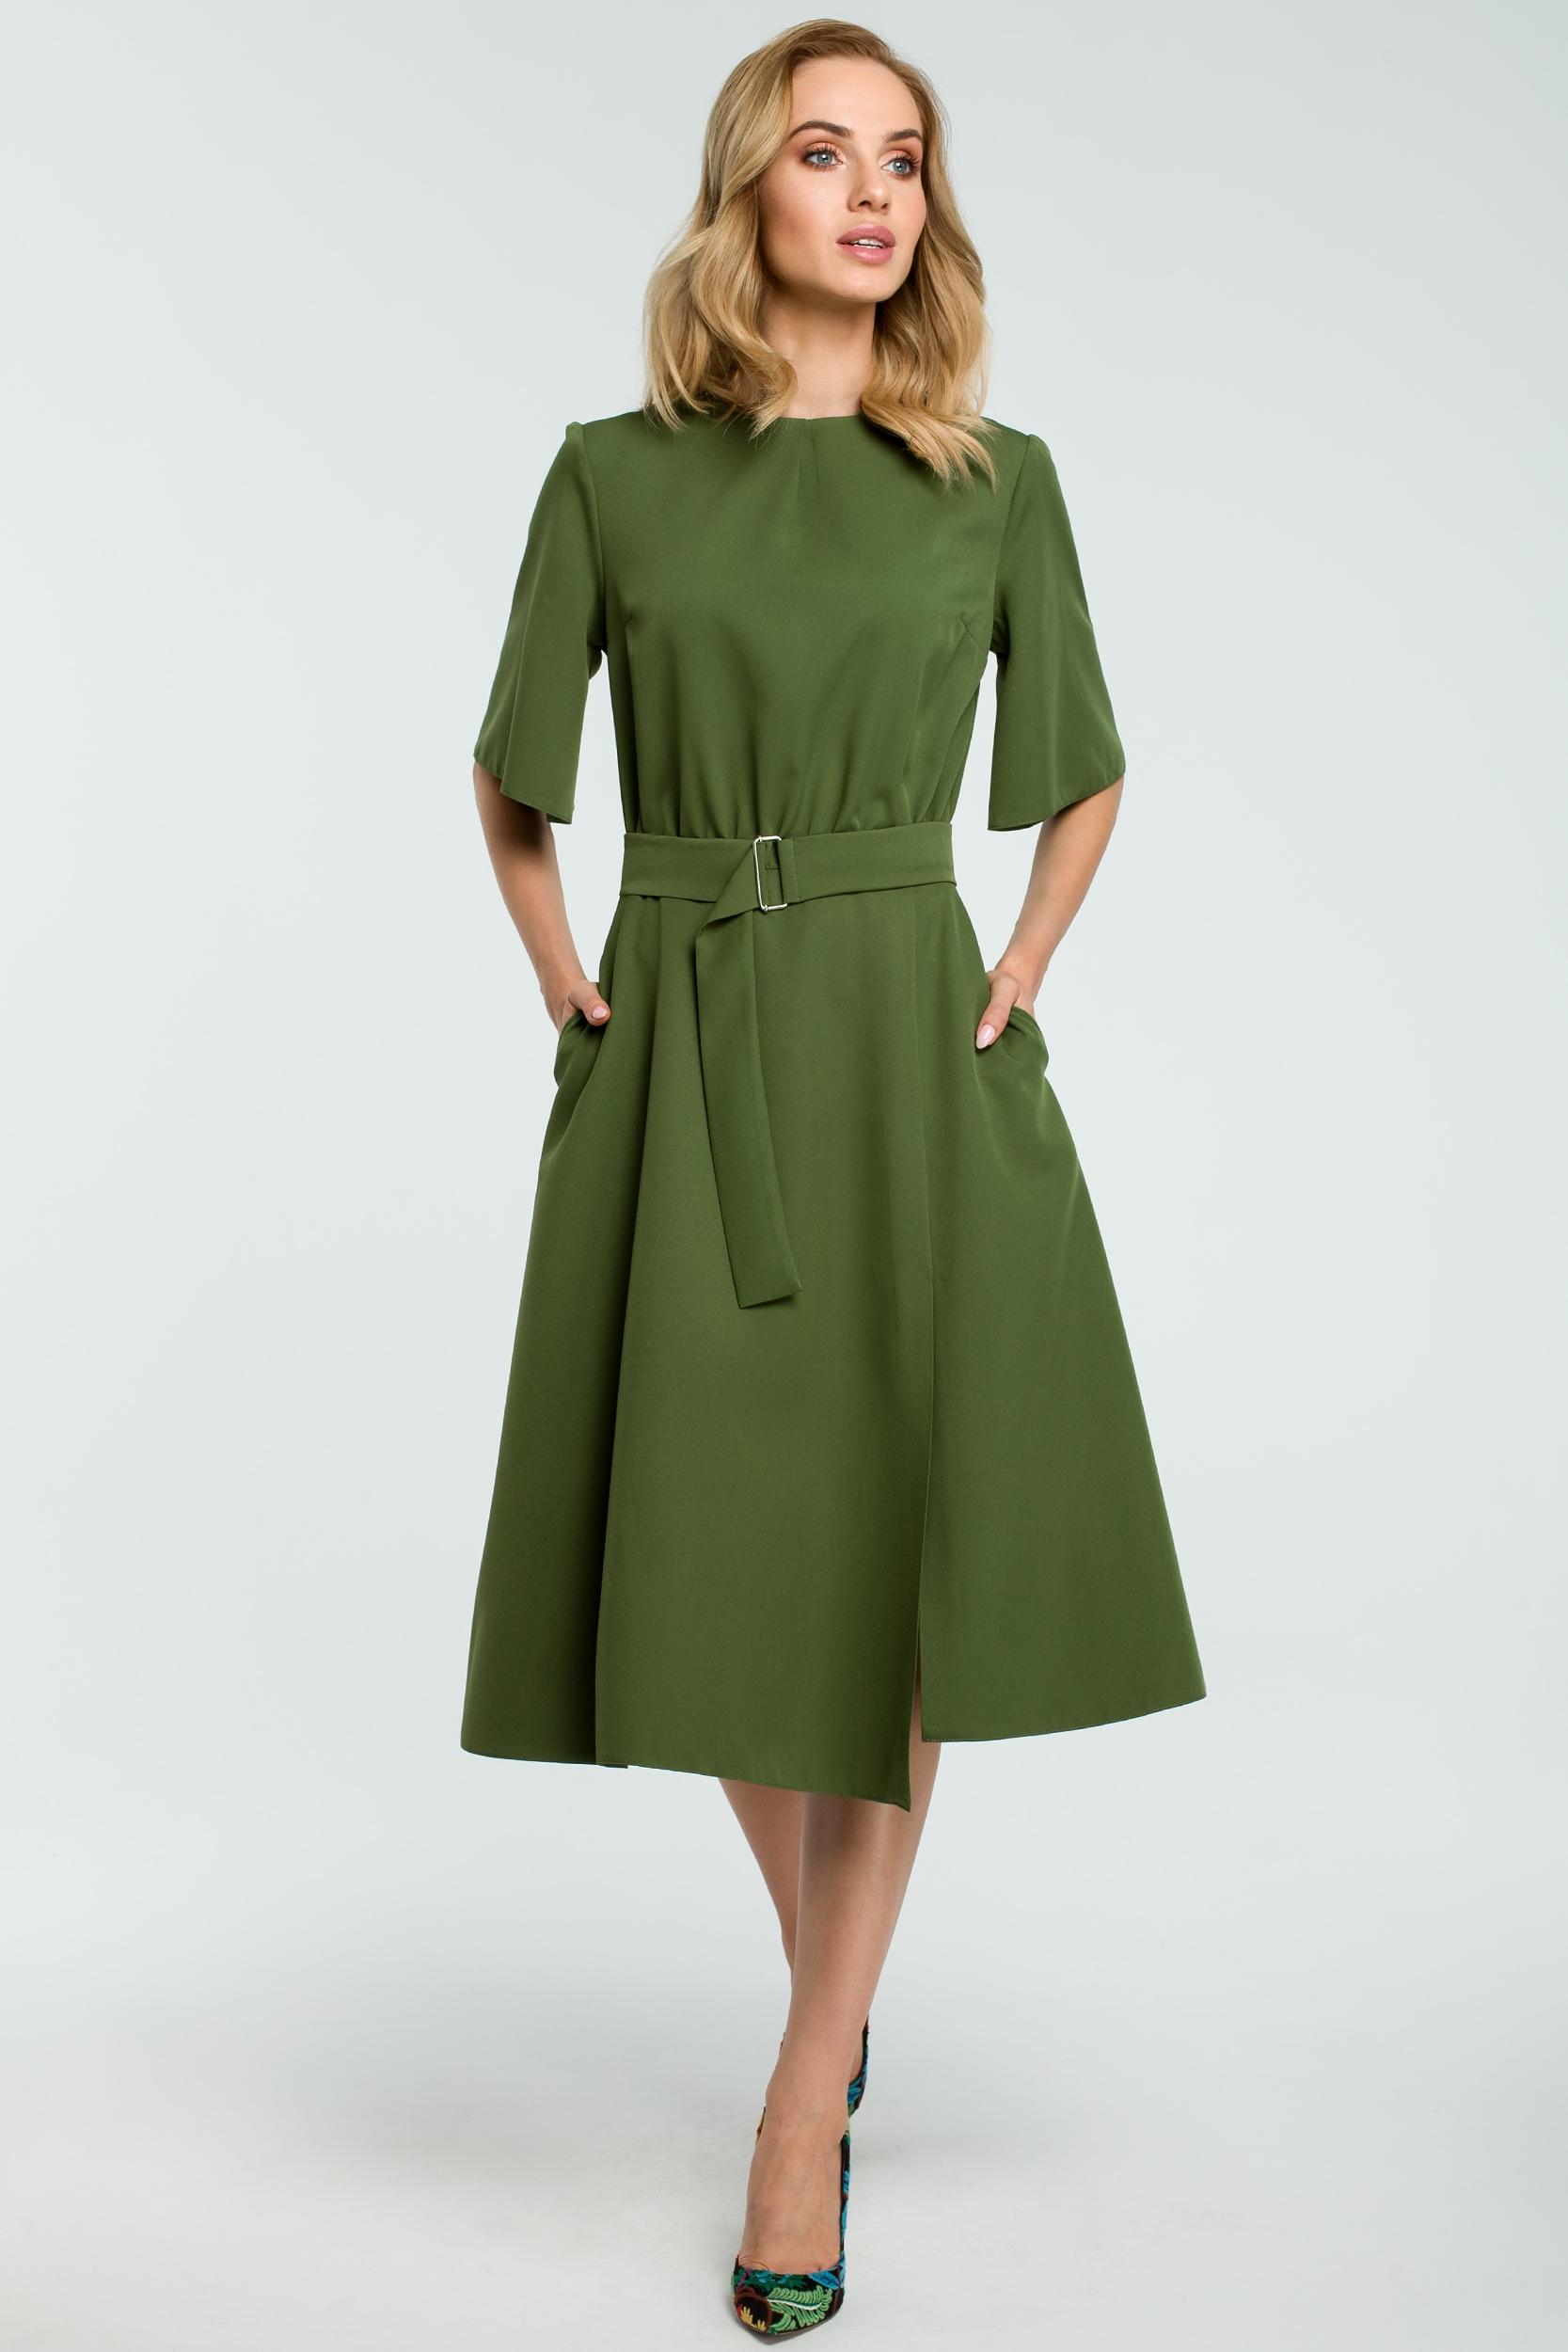 65d8c2c837d6 Zelené šaty Moe 396 - Glami.sk